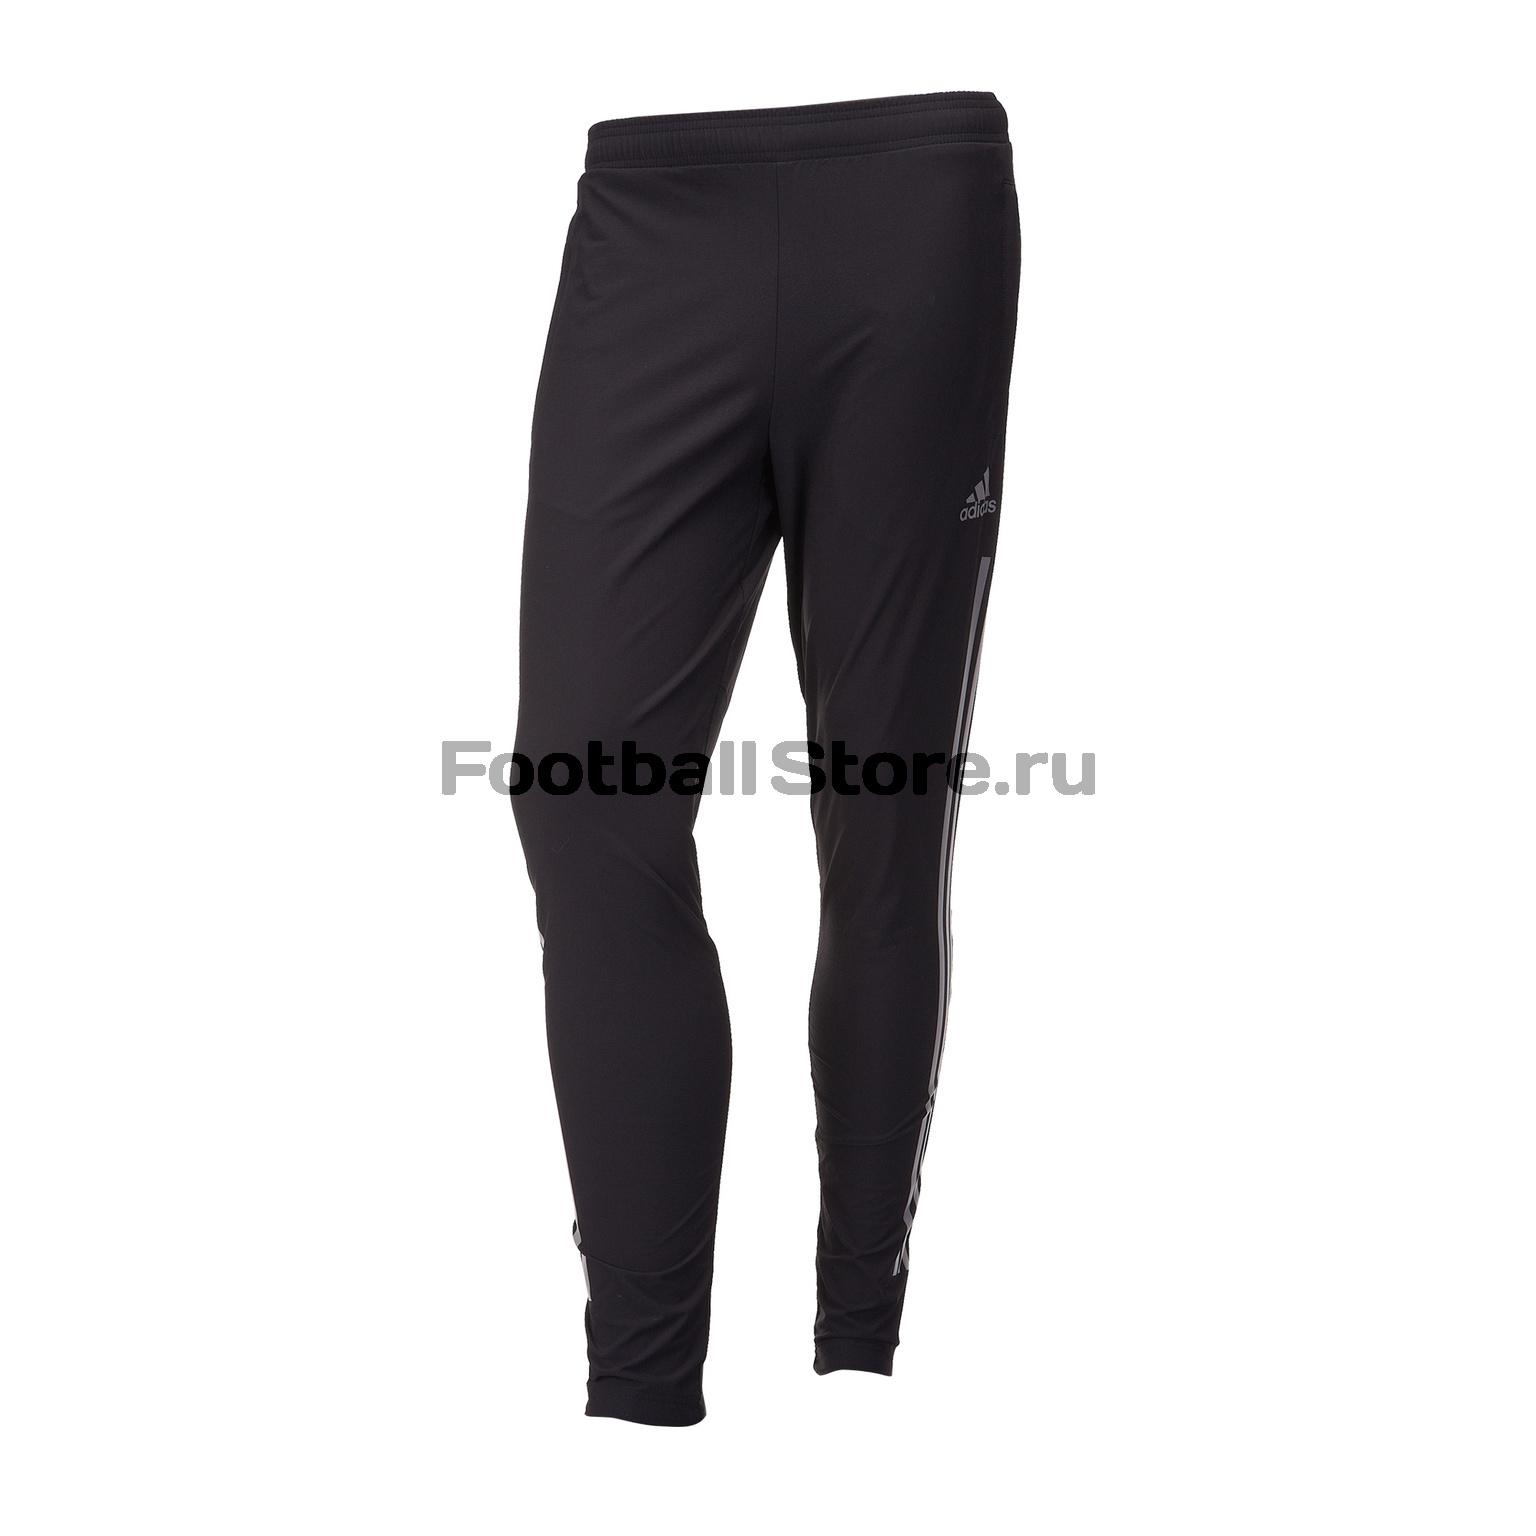 Брюки тренировочные Adidas Tec Pnt CW7394 available from 10 11 adidas bowling jackets m64001